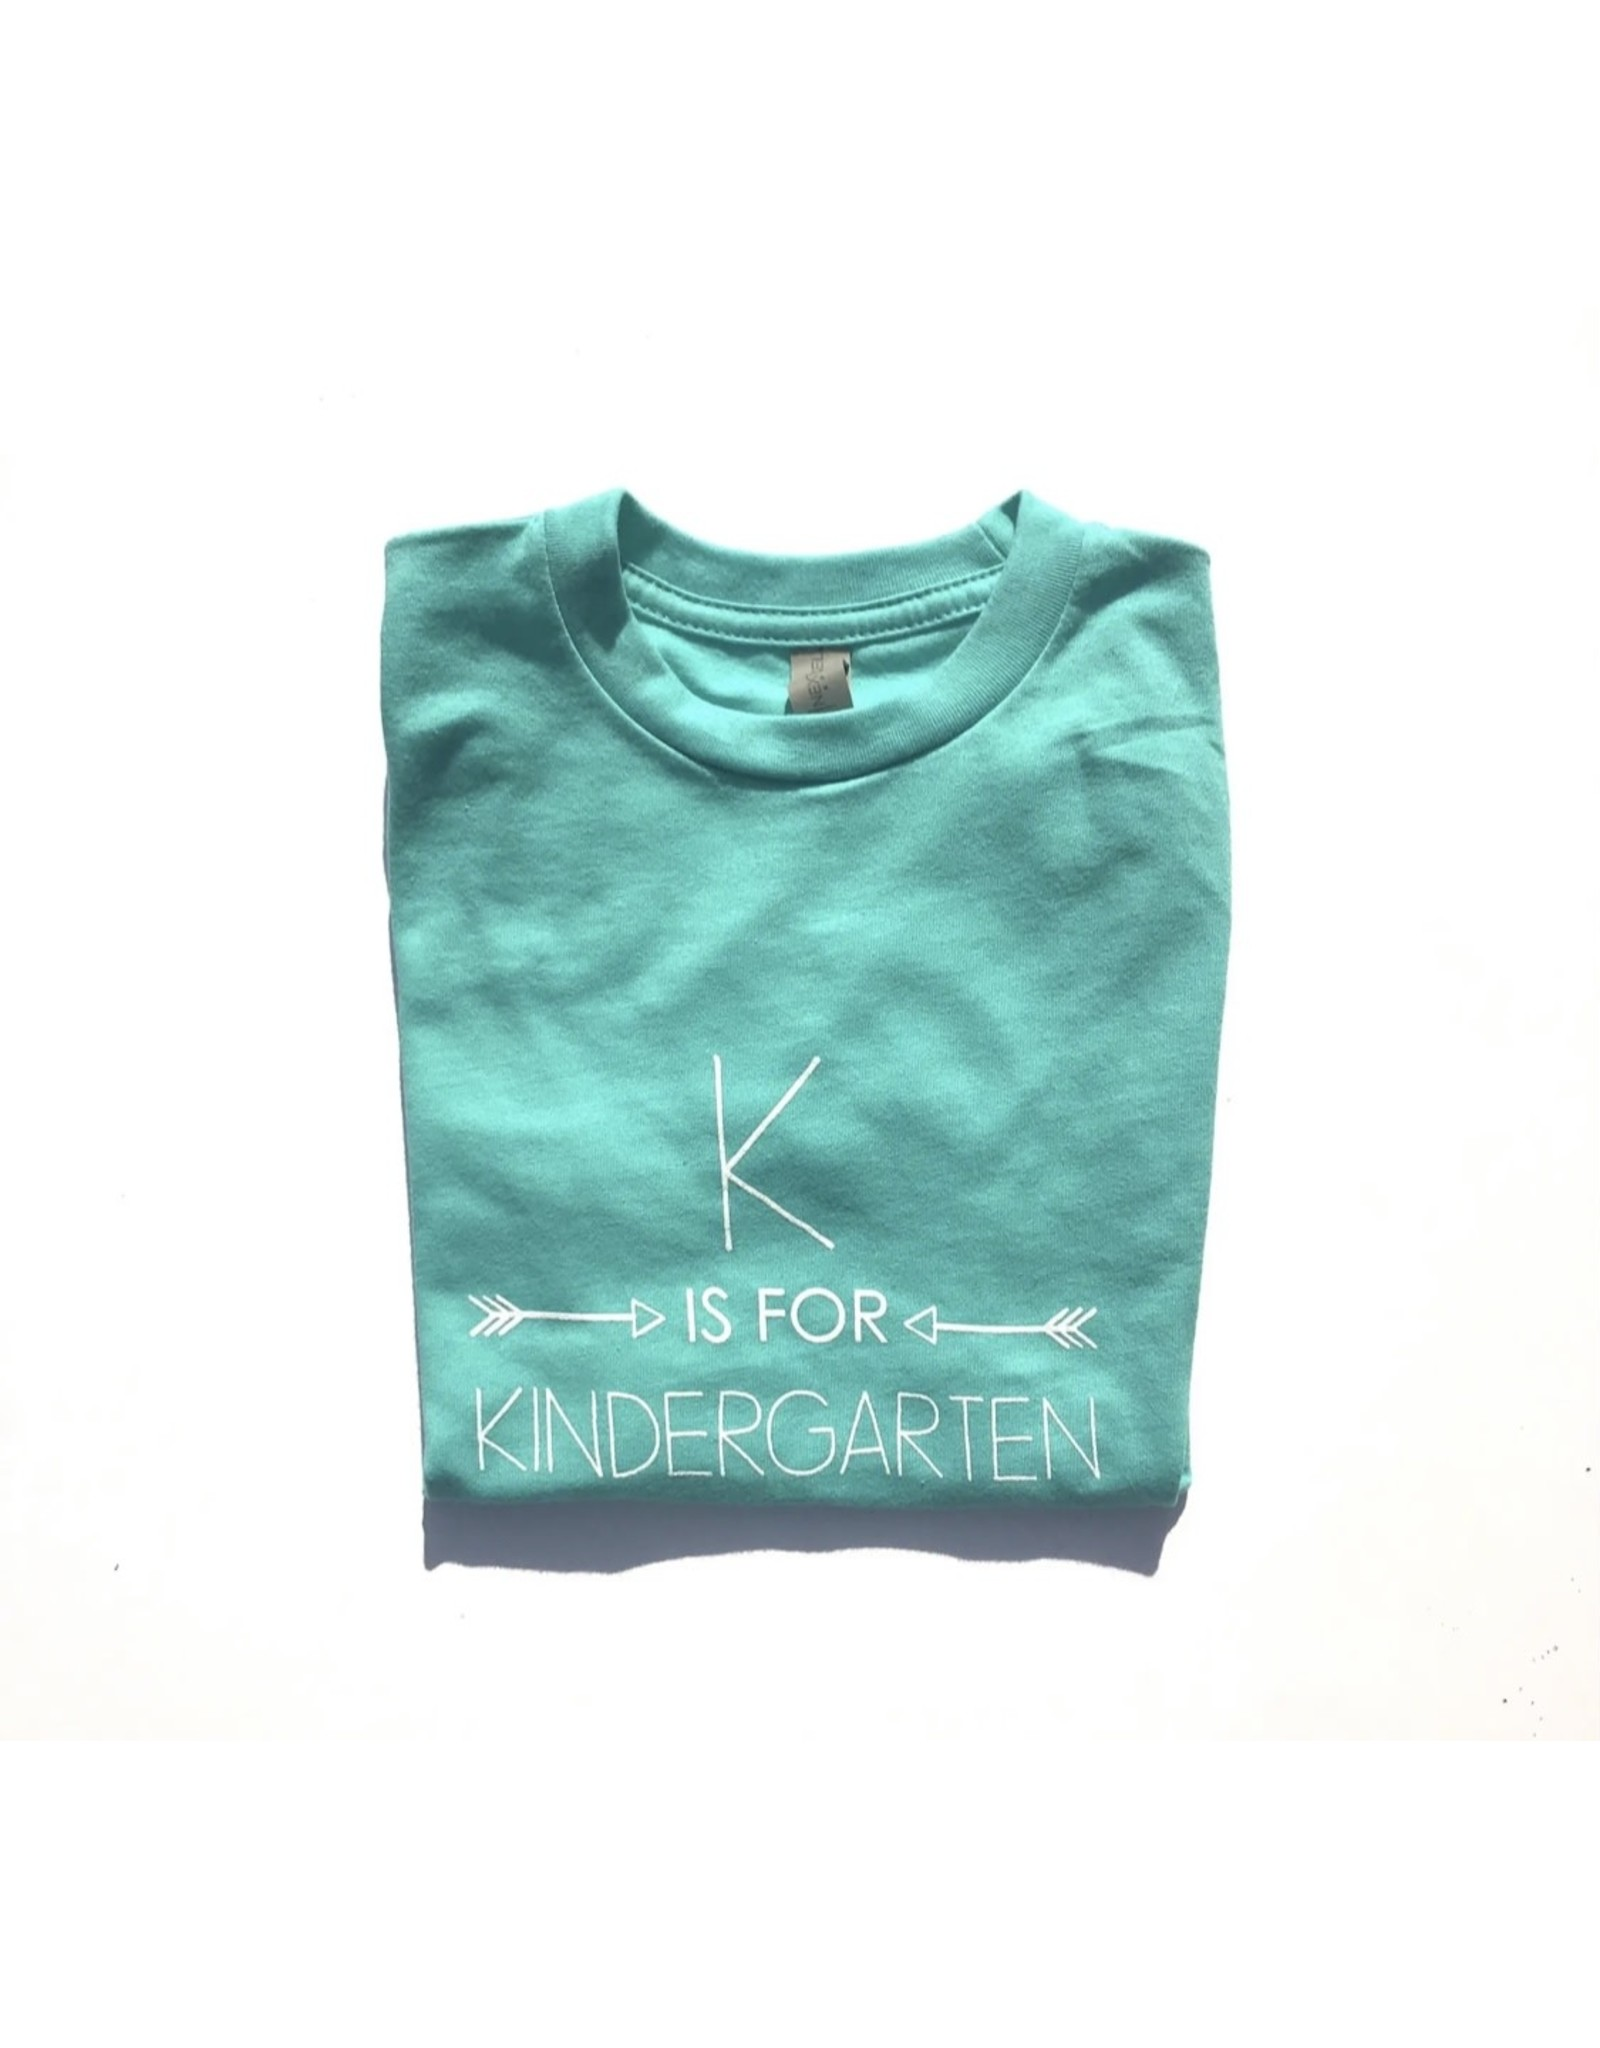 Little Hoot- K is for Kindergarten: Tahiti Blue